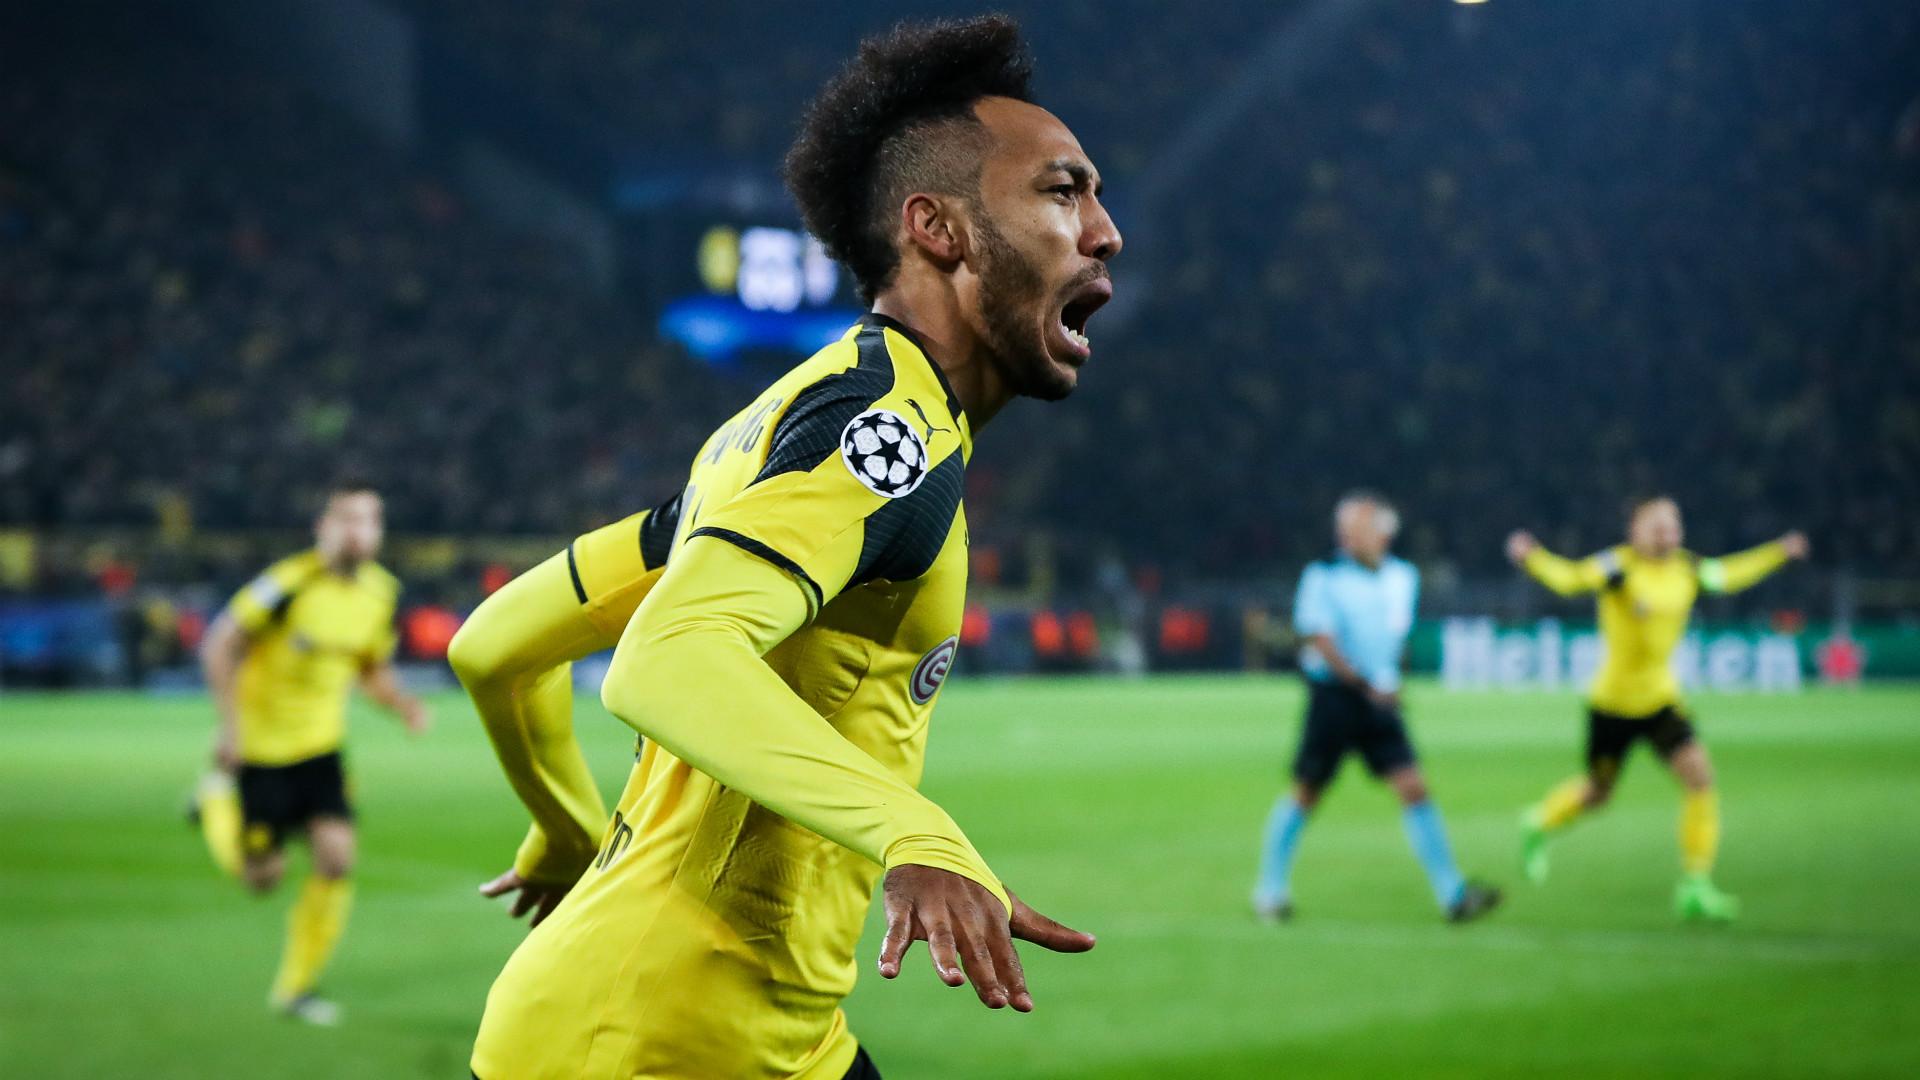 Pierre-Emerick Aubameyang Borussia Dortmund Champions League